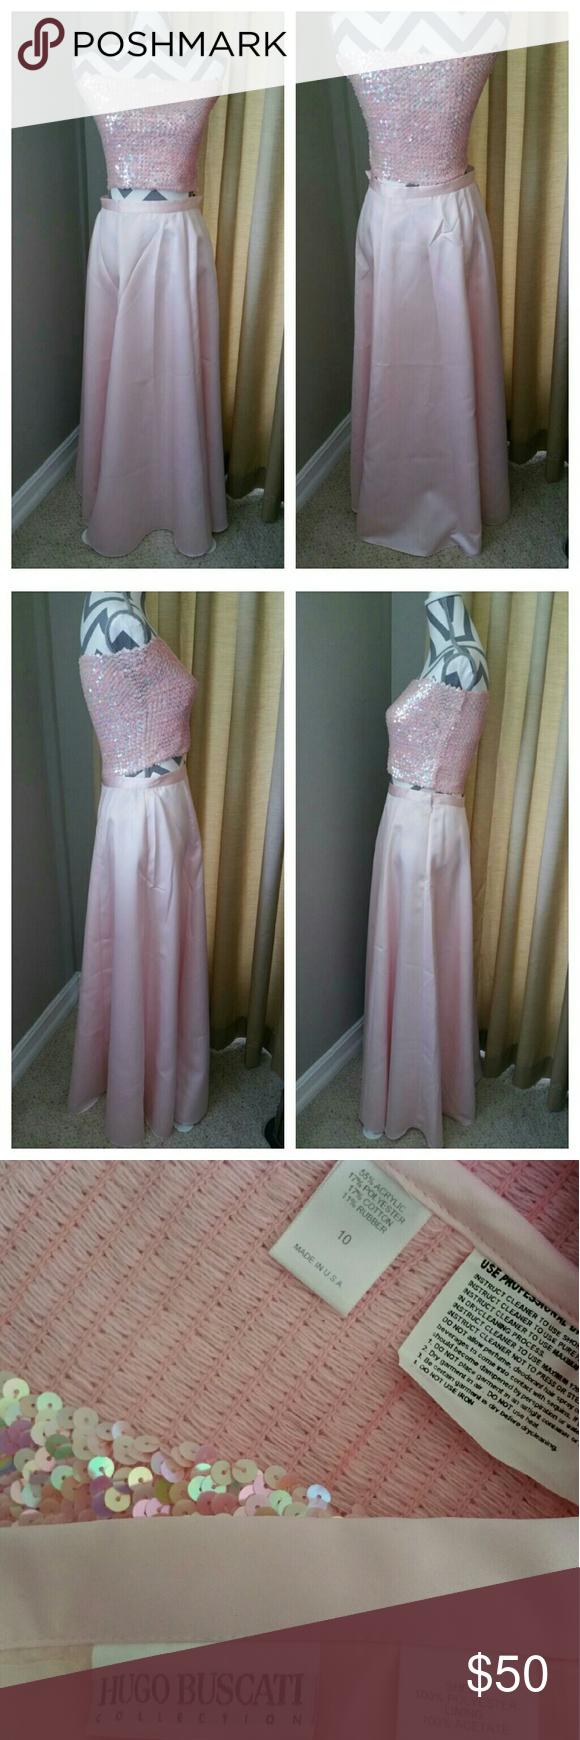 Hugo buscati pretty in pink piece prom dress my posh picks